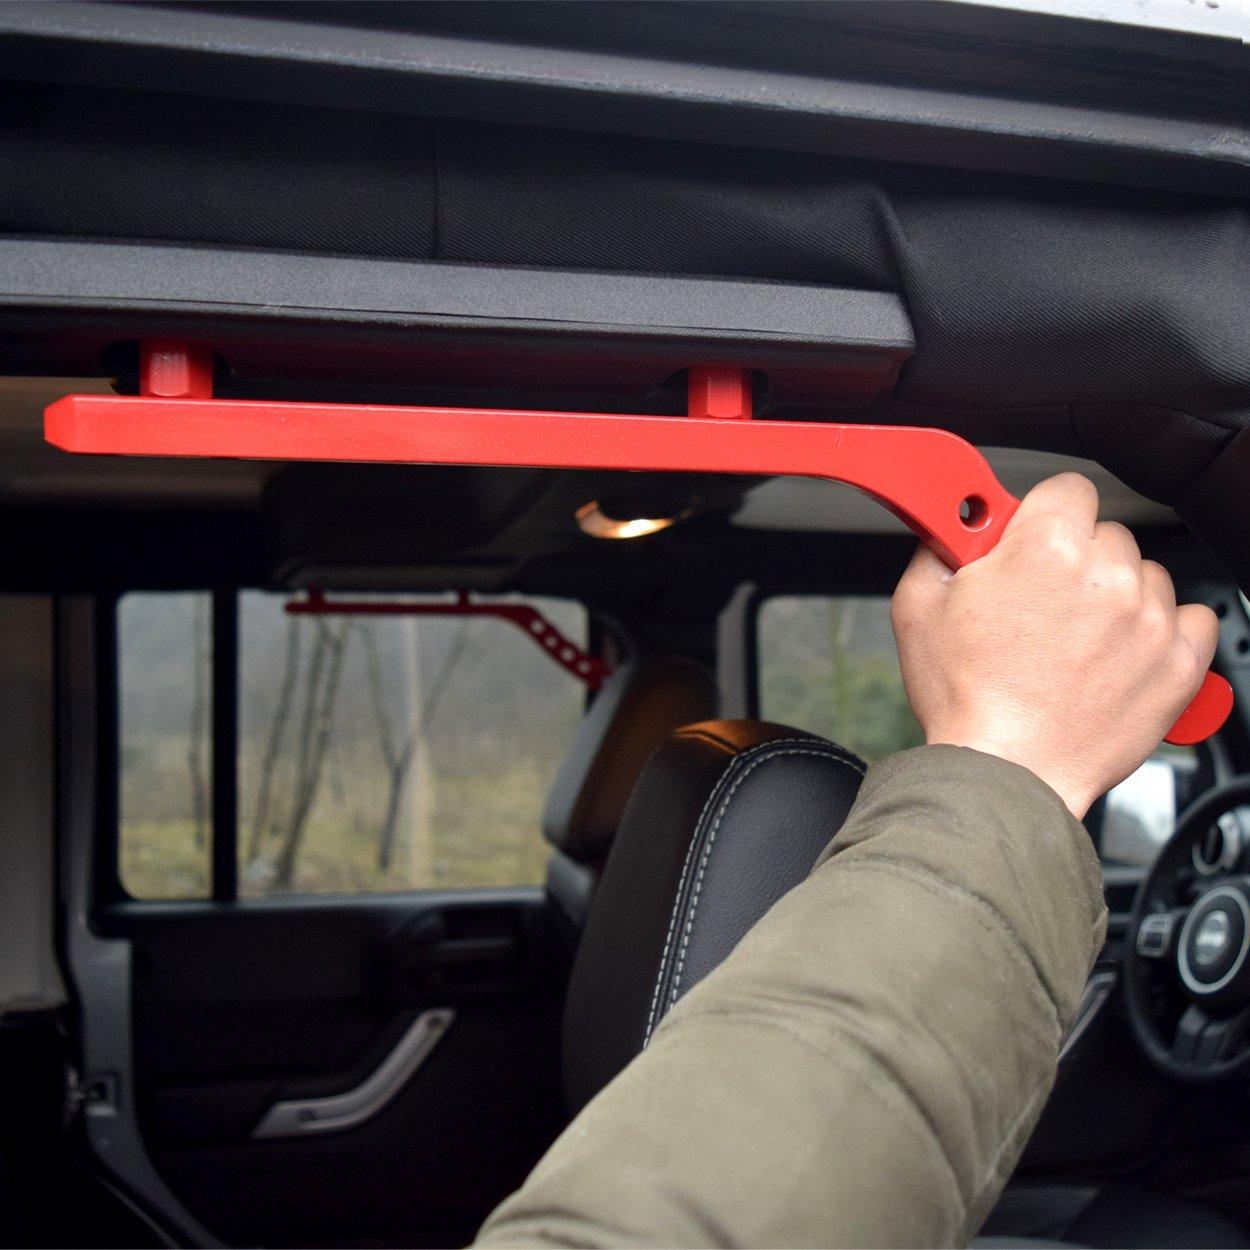 Black Pair AMERICAN MODIFIED Jeep Wrangler Grab Bar Grab Handle Door Handle Rear Grab Handle Jeep Wrangler Accessories JK JKU /& Unlimited Rubicon Sahara Sports 2007-2018,New Aluminum